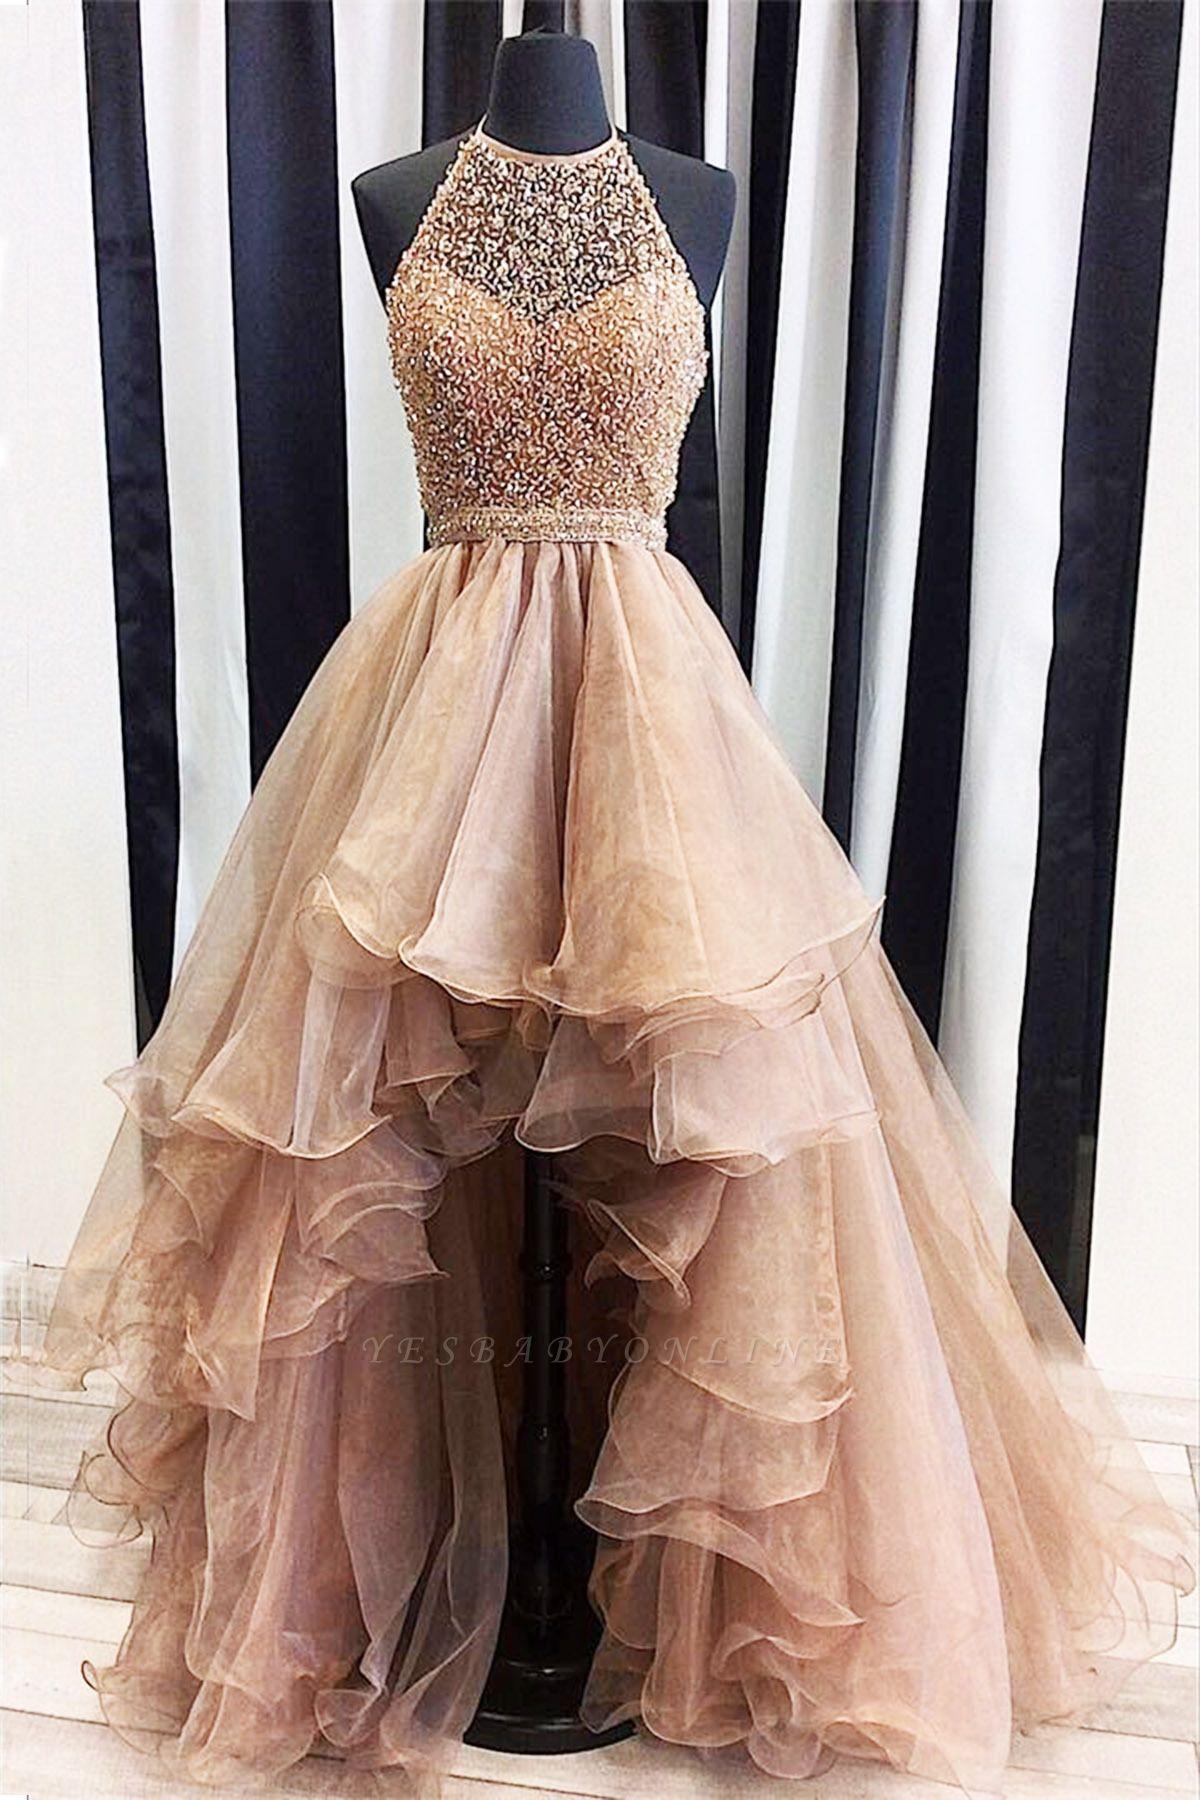 Prom Dresses Low Halter Beading A-Line Brilliant  High Evening Dresses